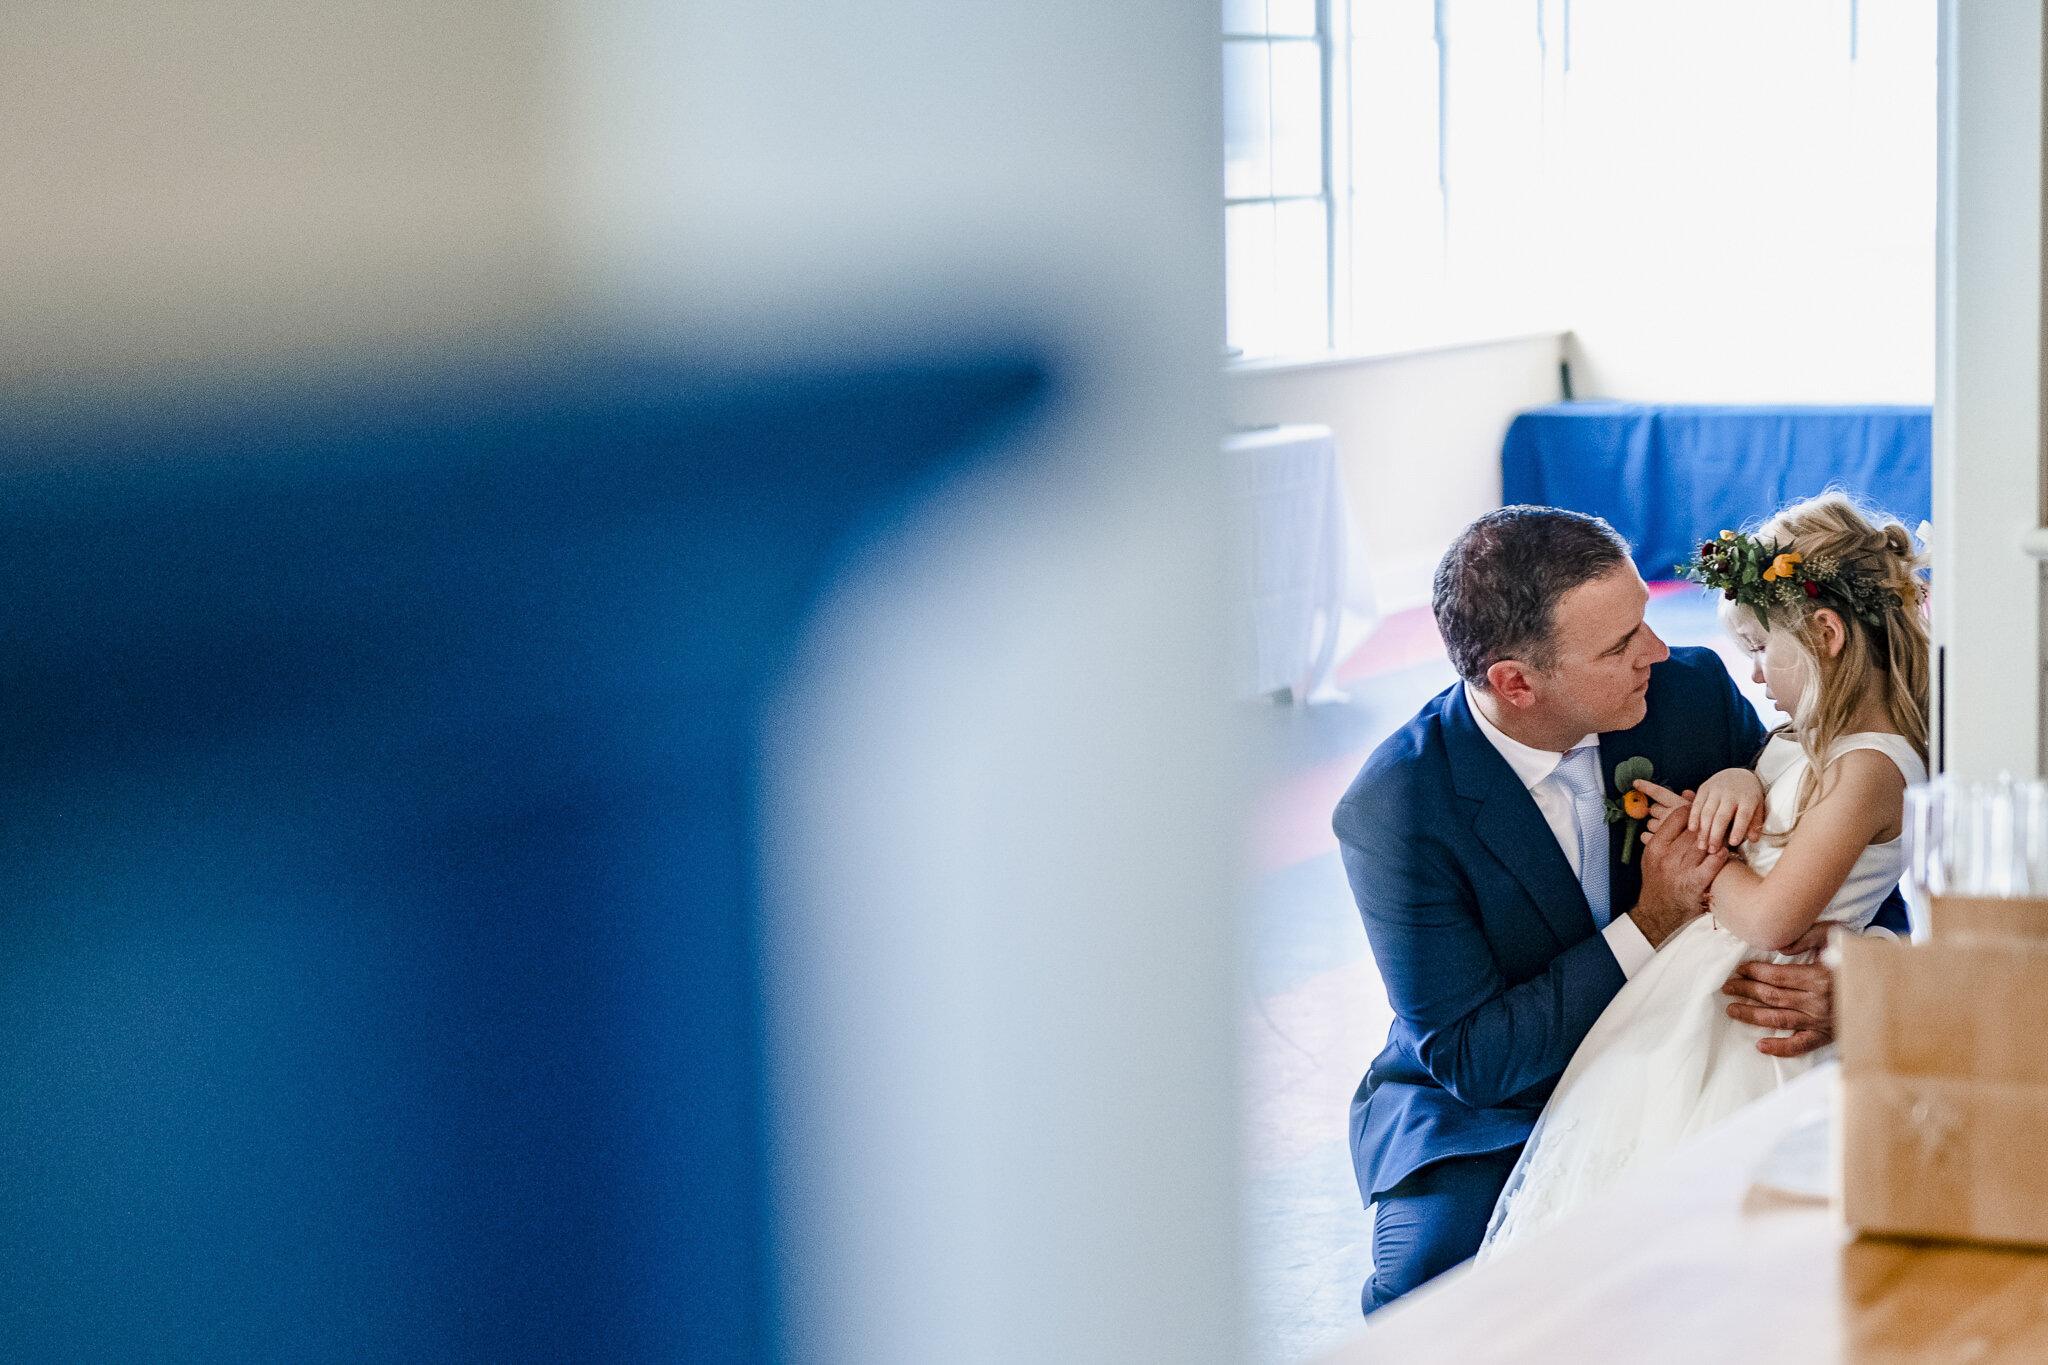 Snell-Ocean-City-Yacht-Club-New-Jersey-Wedding-Photographer-17.JPG